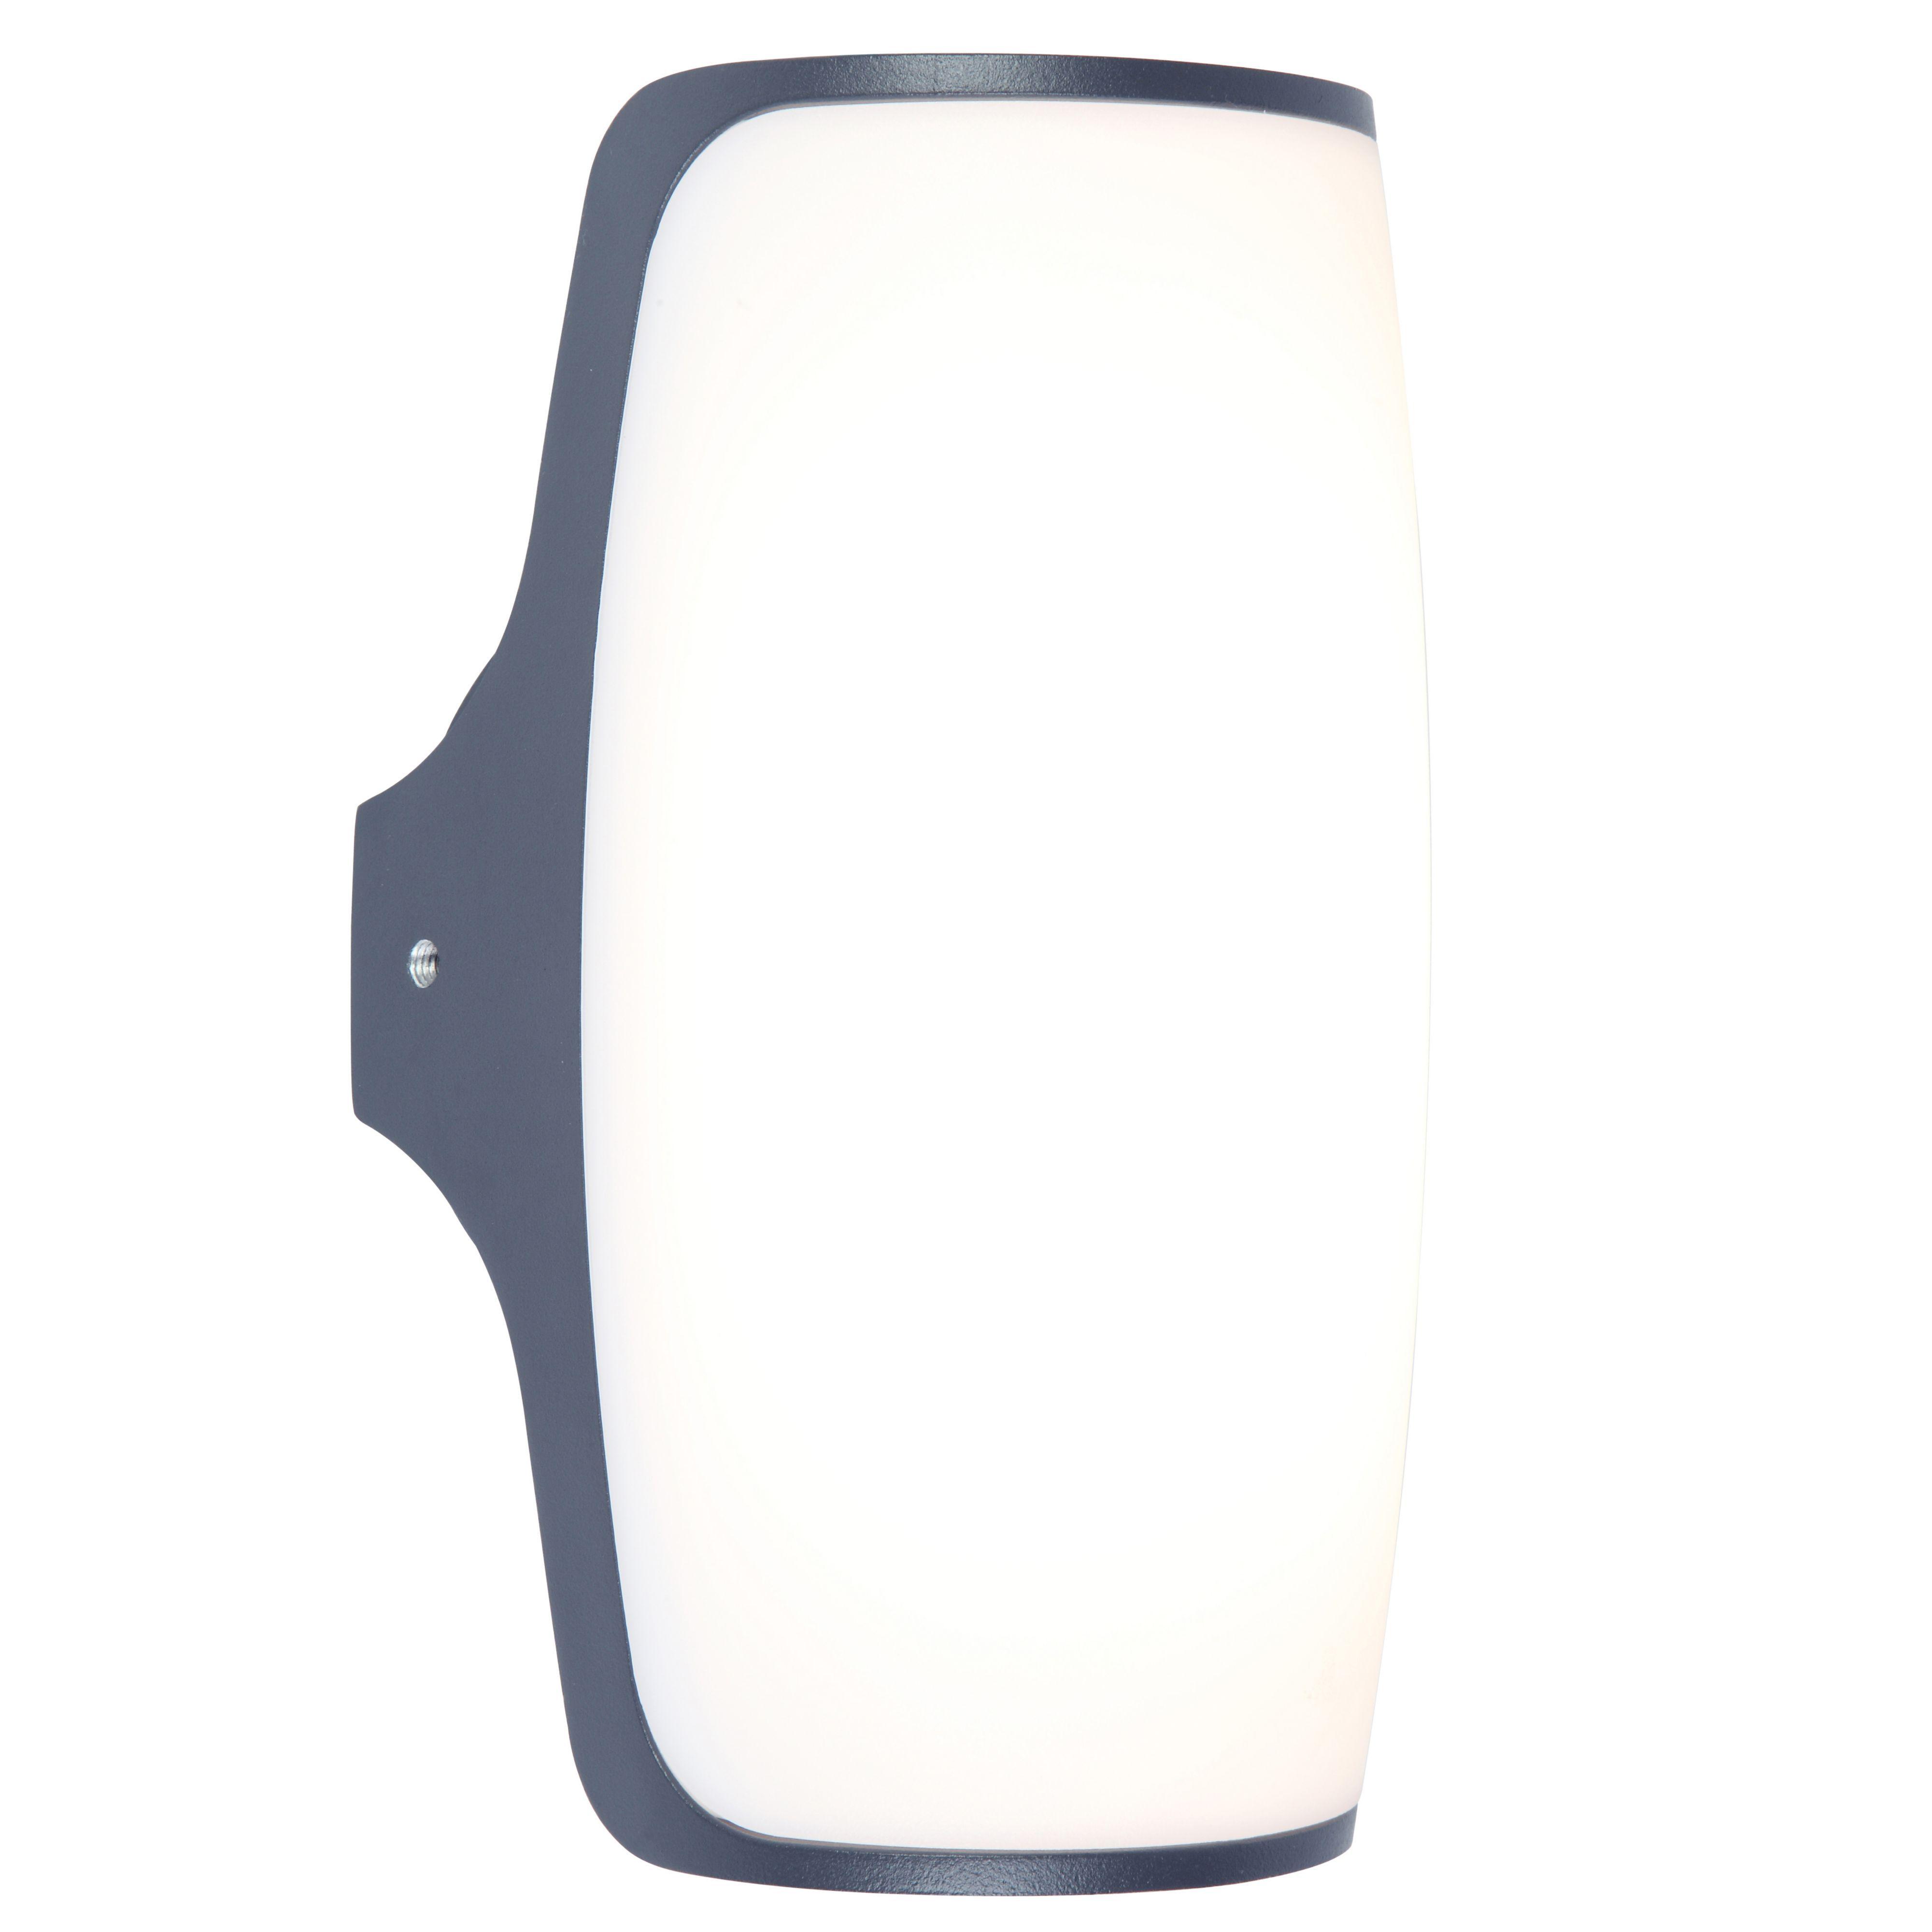 Blooma Ixion Dark Grey Mains Powered External Wall Light